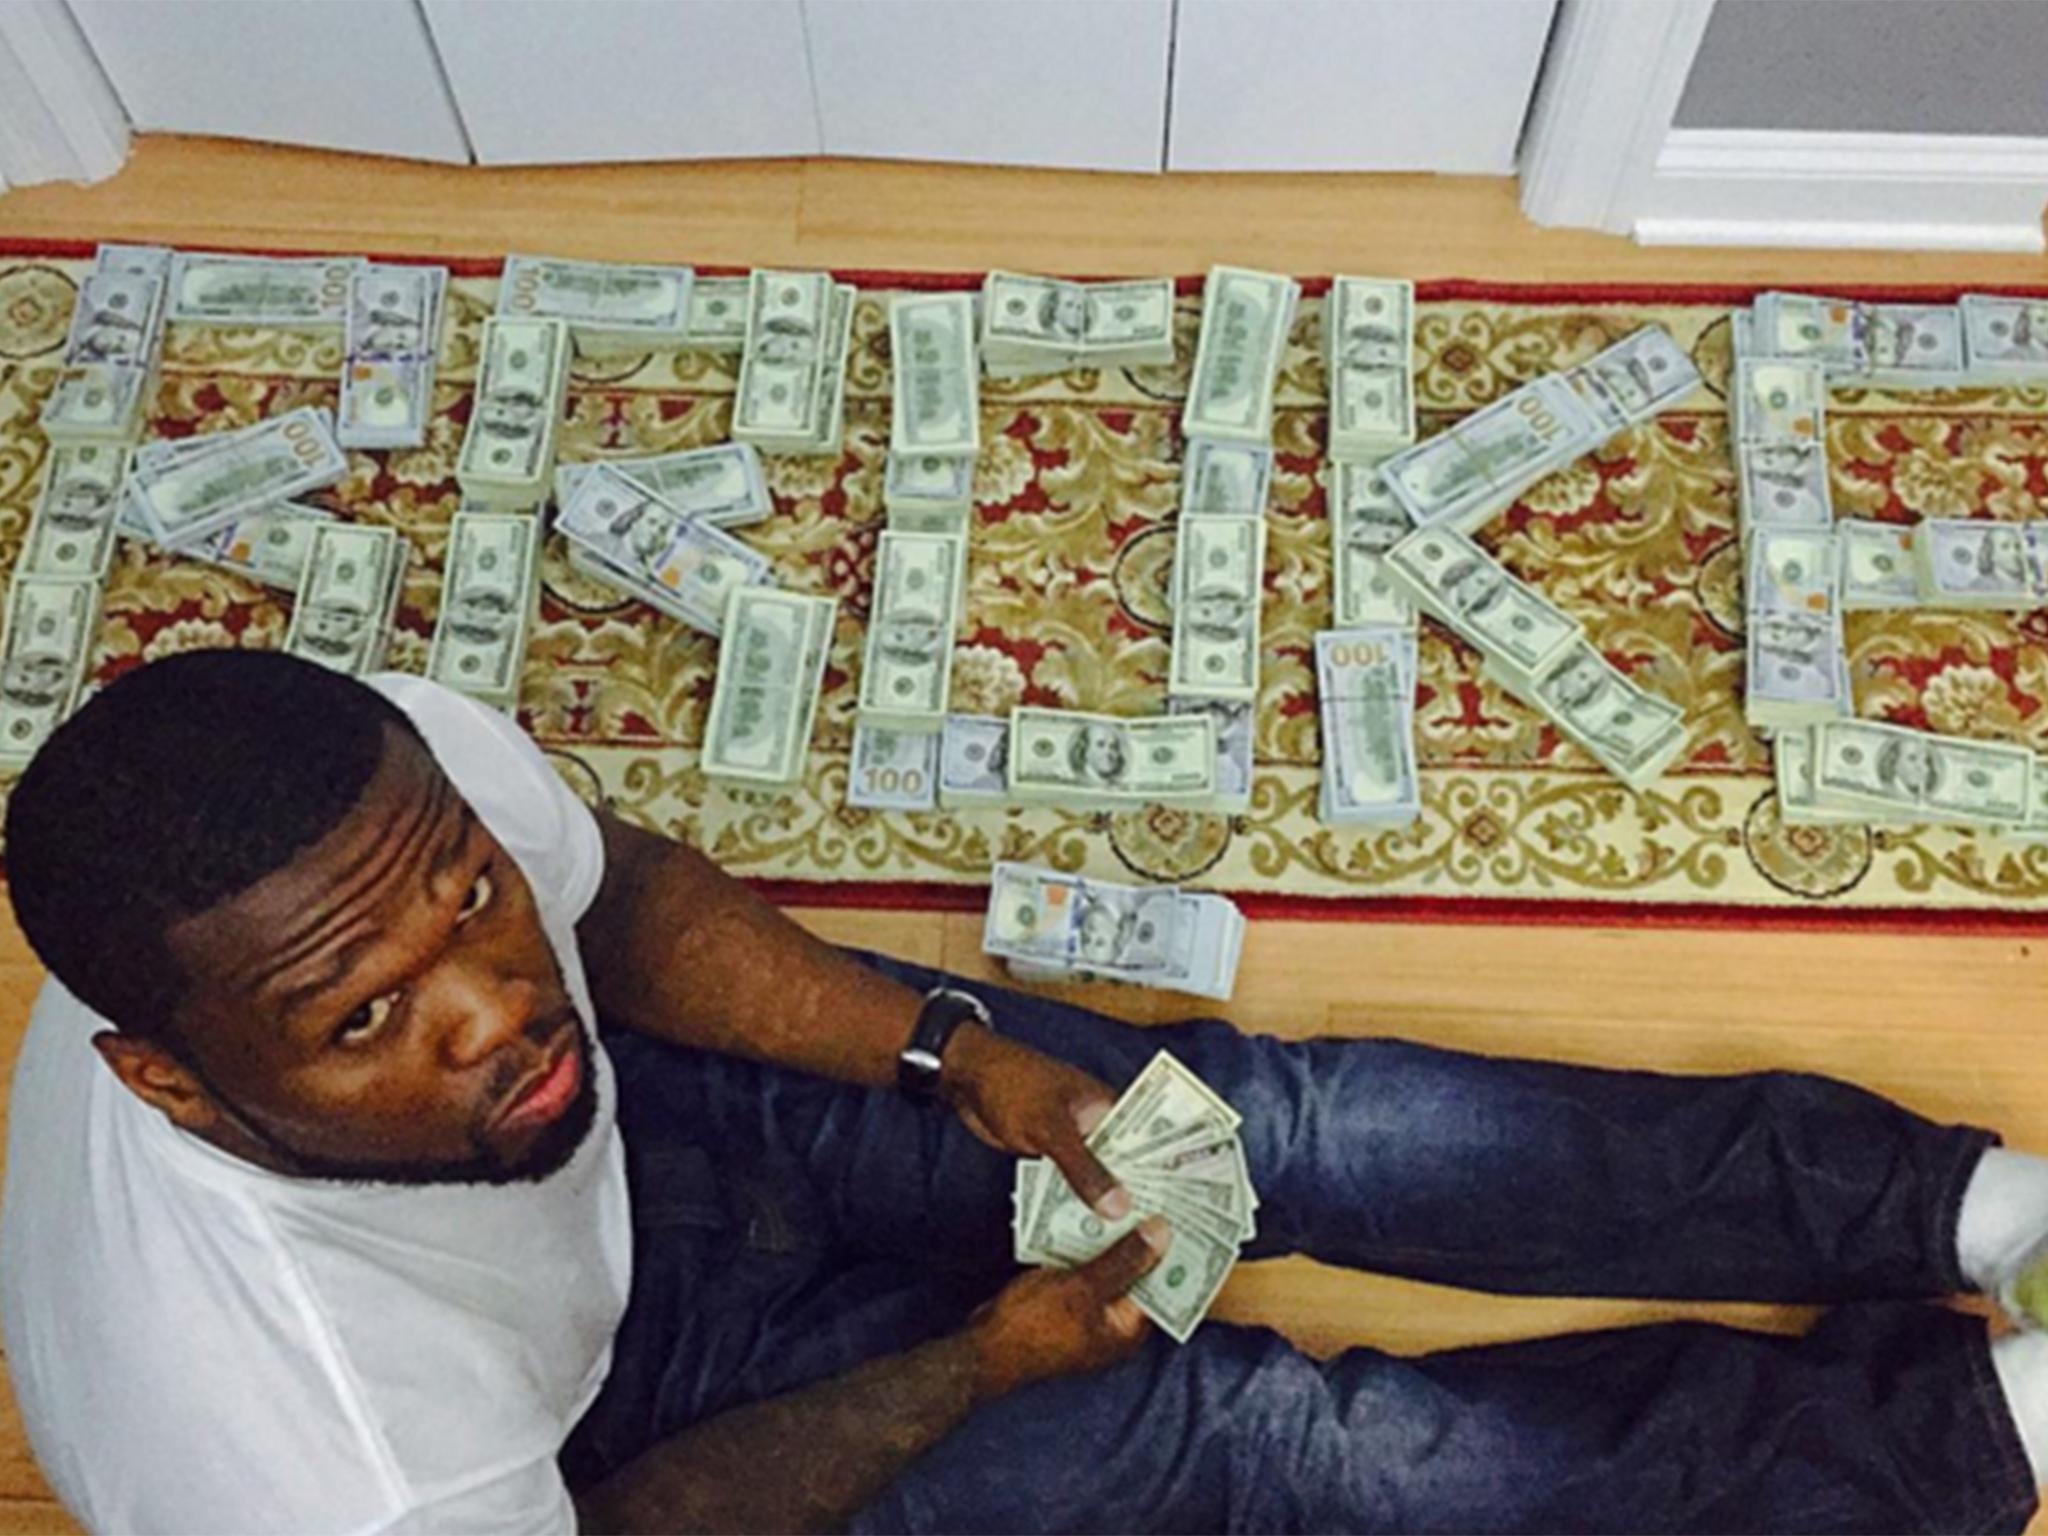 50centbroke